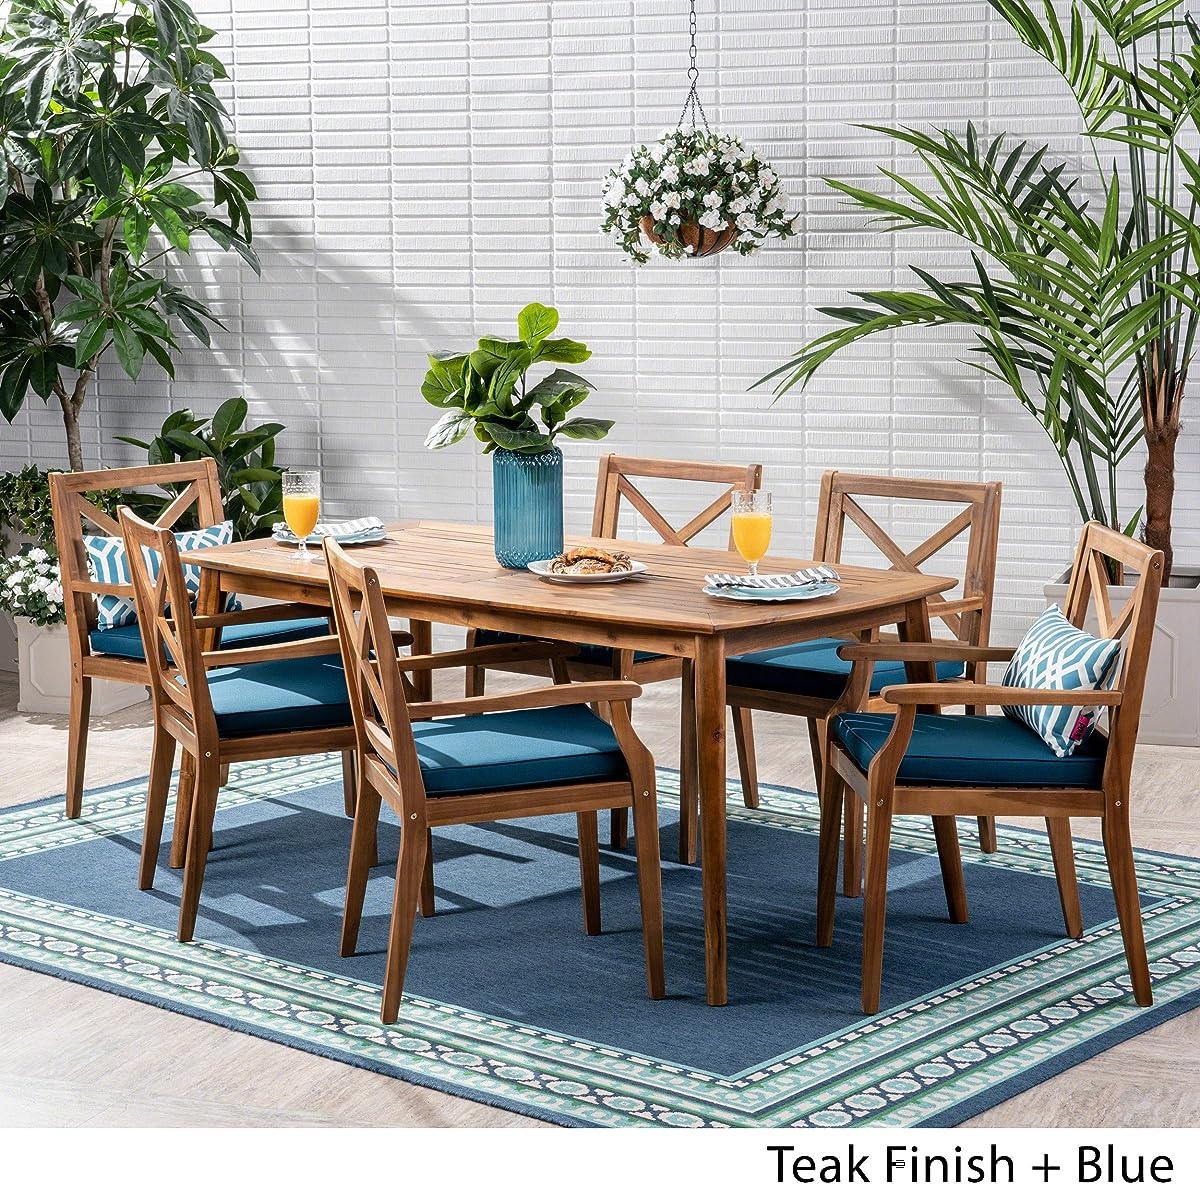 Great Deal Furniture Harvey Outdoor 7 Piece Acacia Wood Dining Set, Teak and Blue